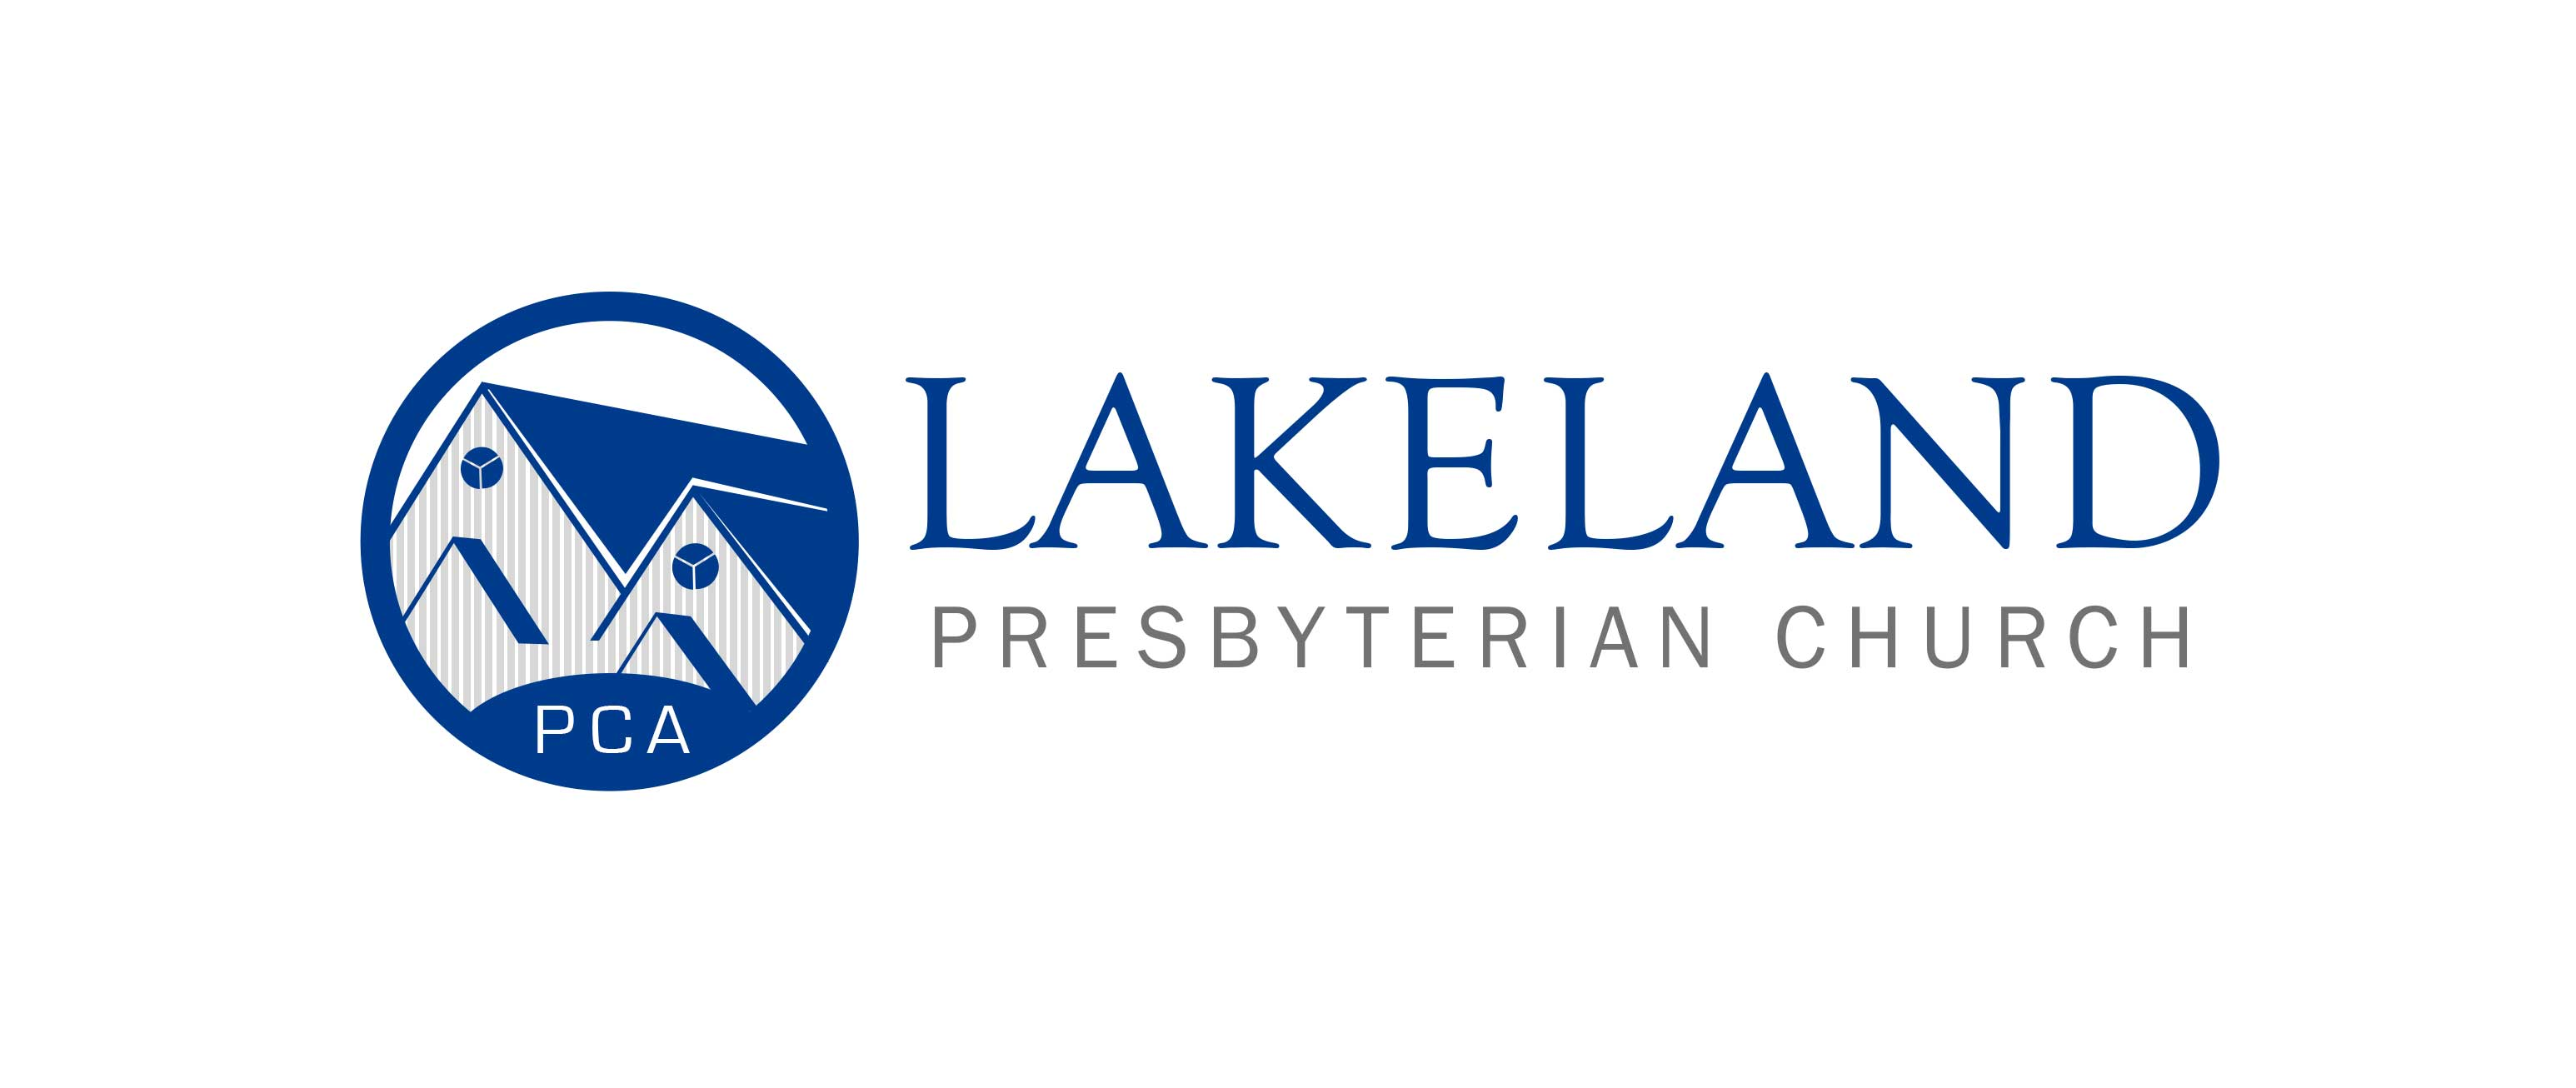 Lakeland Presbyterian Church Logo Design